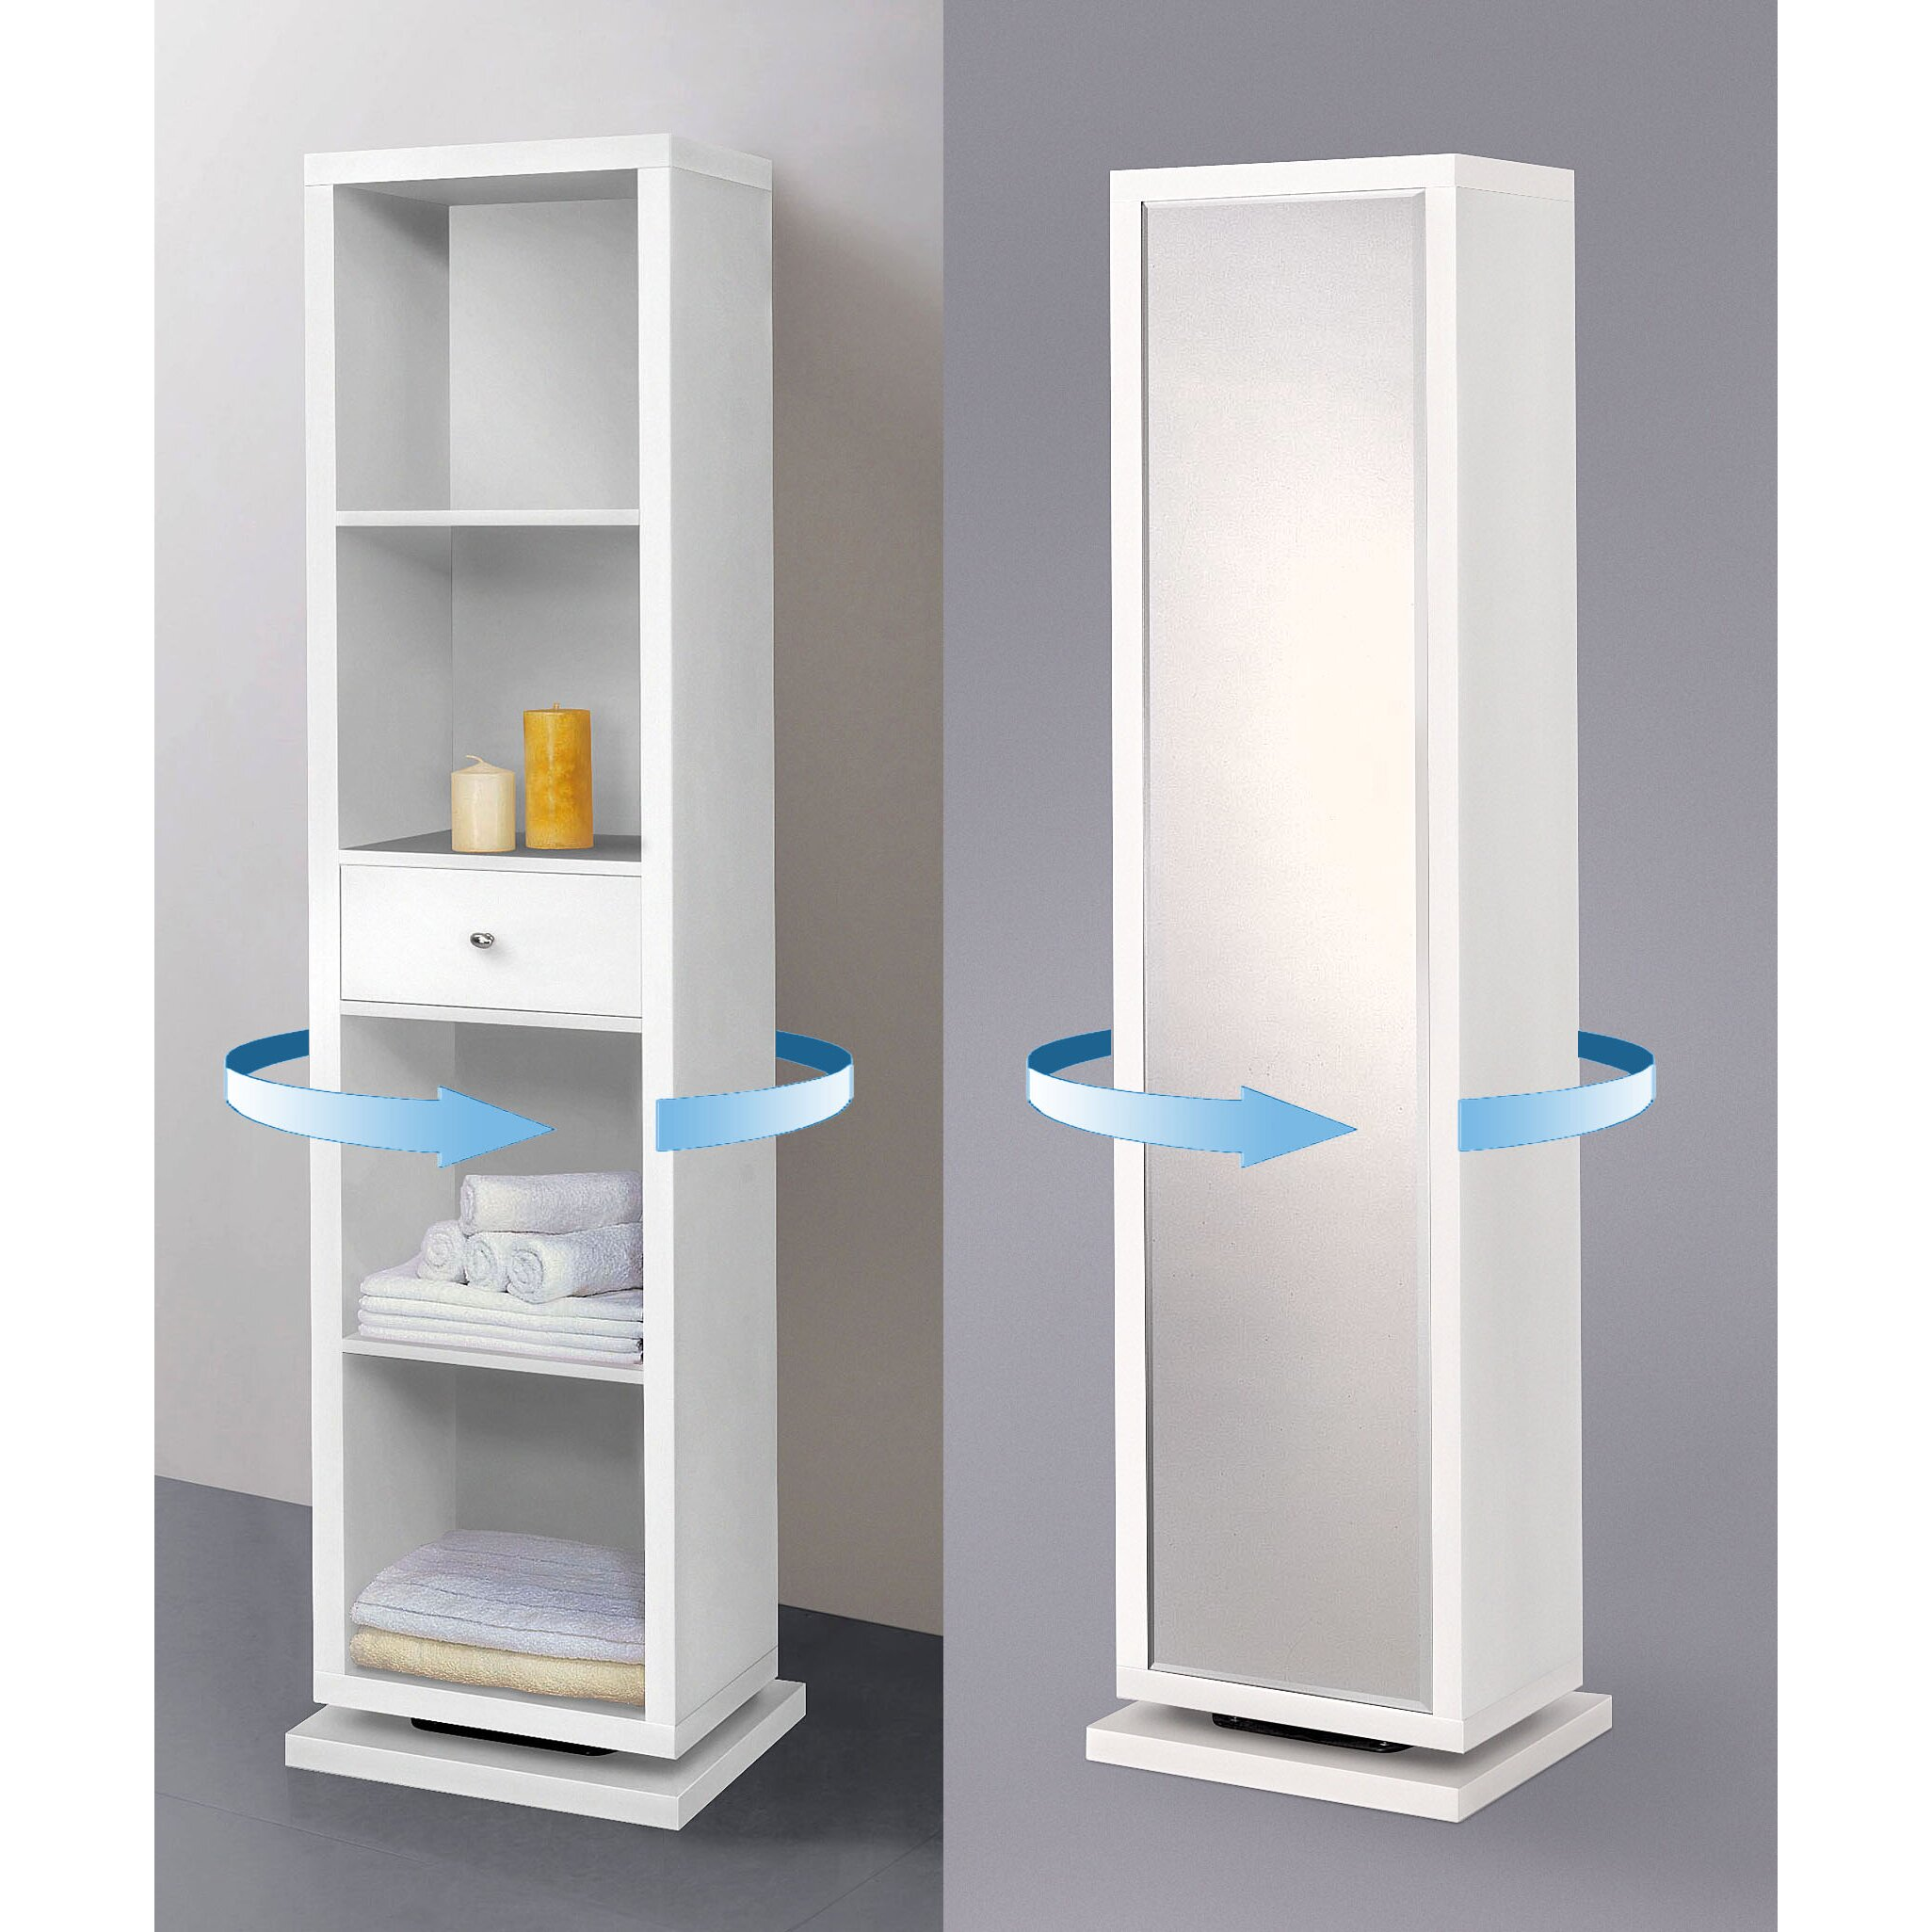 Linen tower cabinets bathroom - Rustic Linen Cabinet Bella Home Deluxe 17 25 W X 71 H Linen Tower